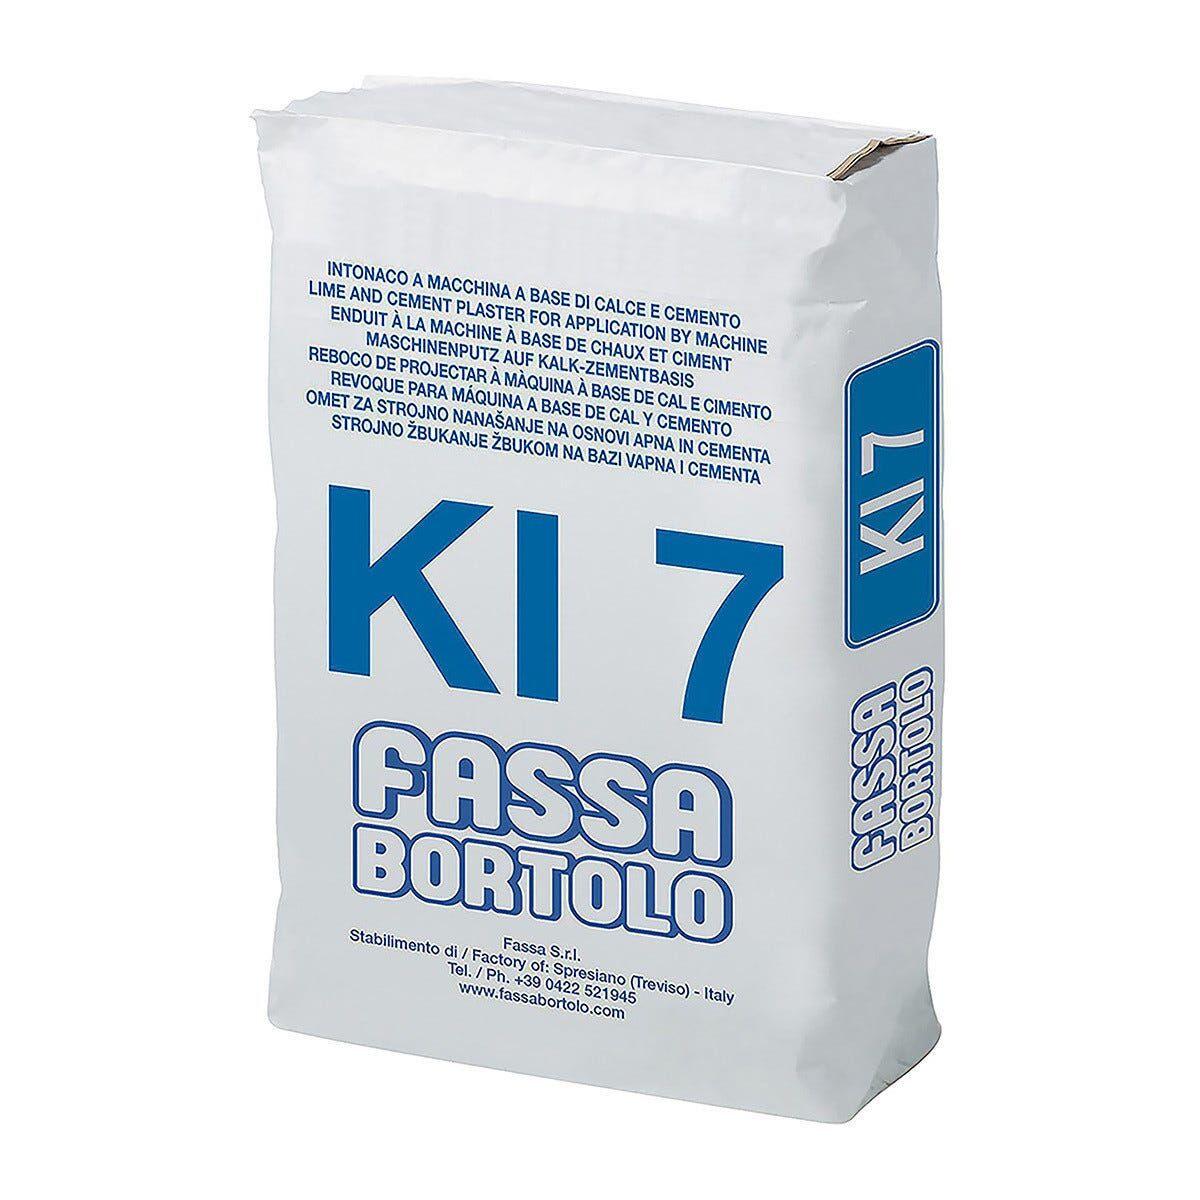 intonaco fibrato idrofugato ki7 fassa 25 kg